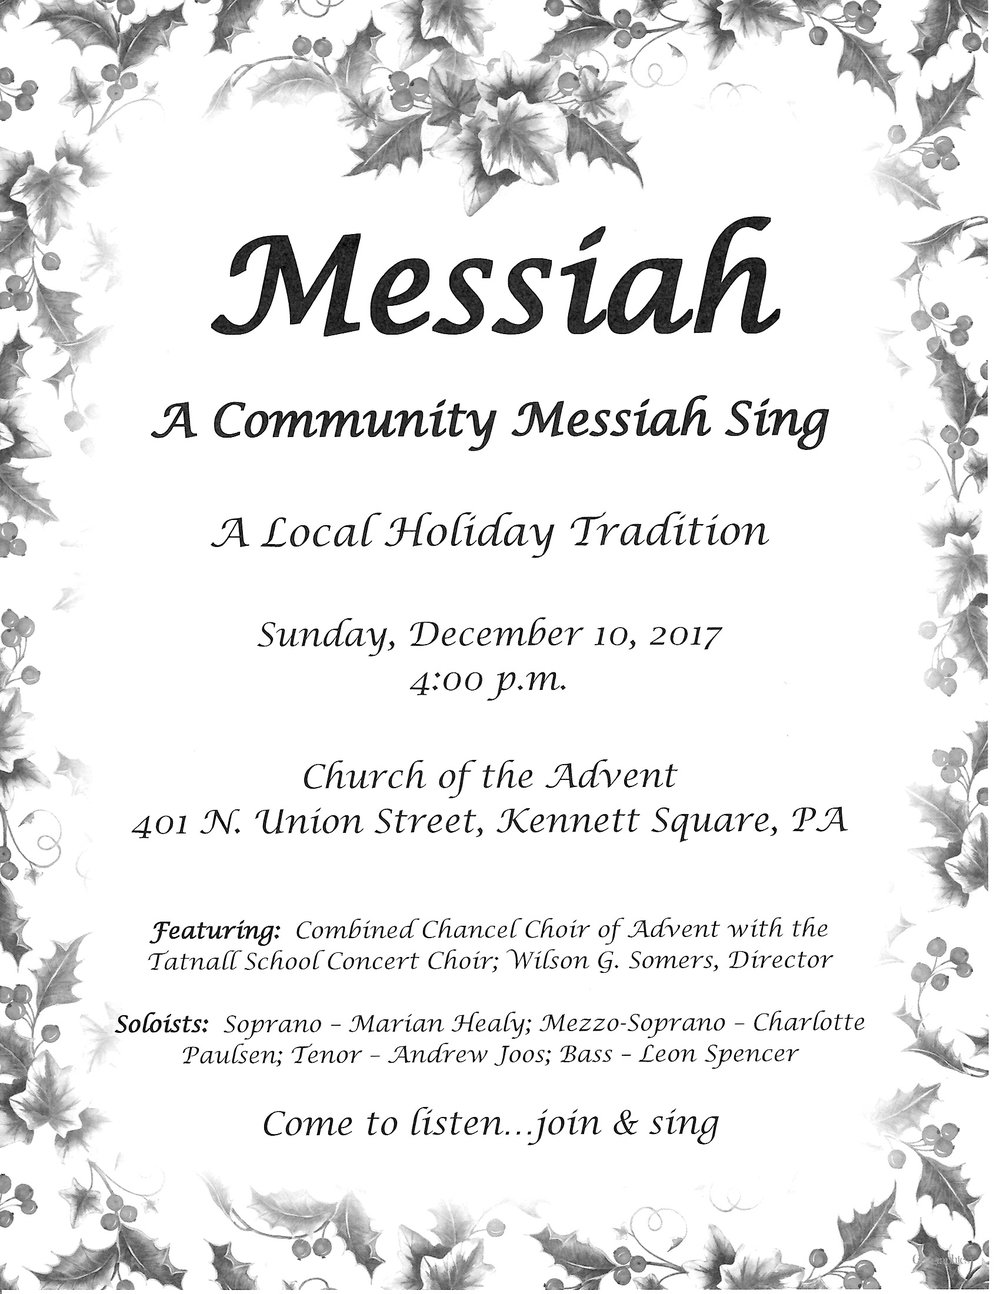 Messiah 2017.JPG